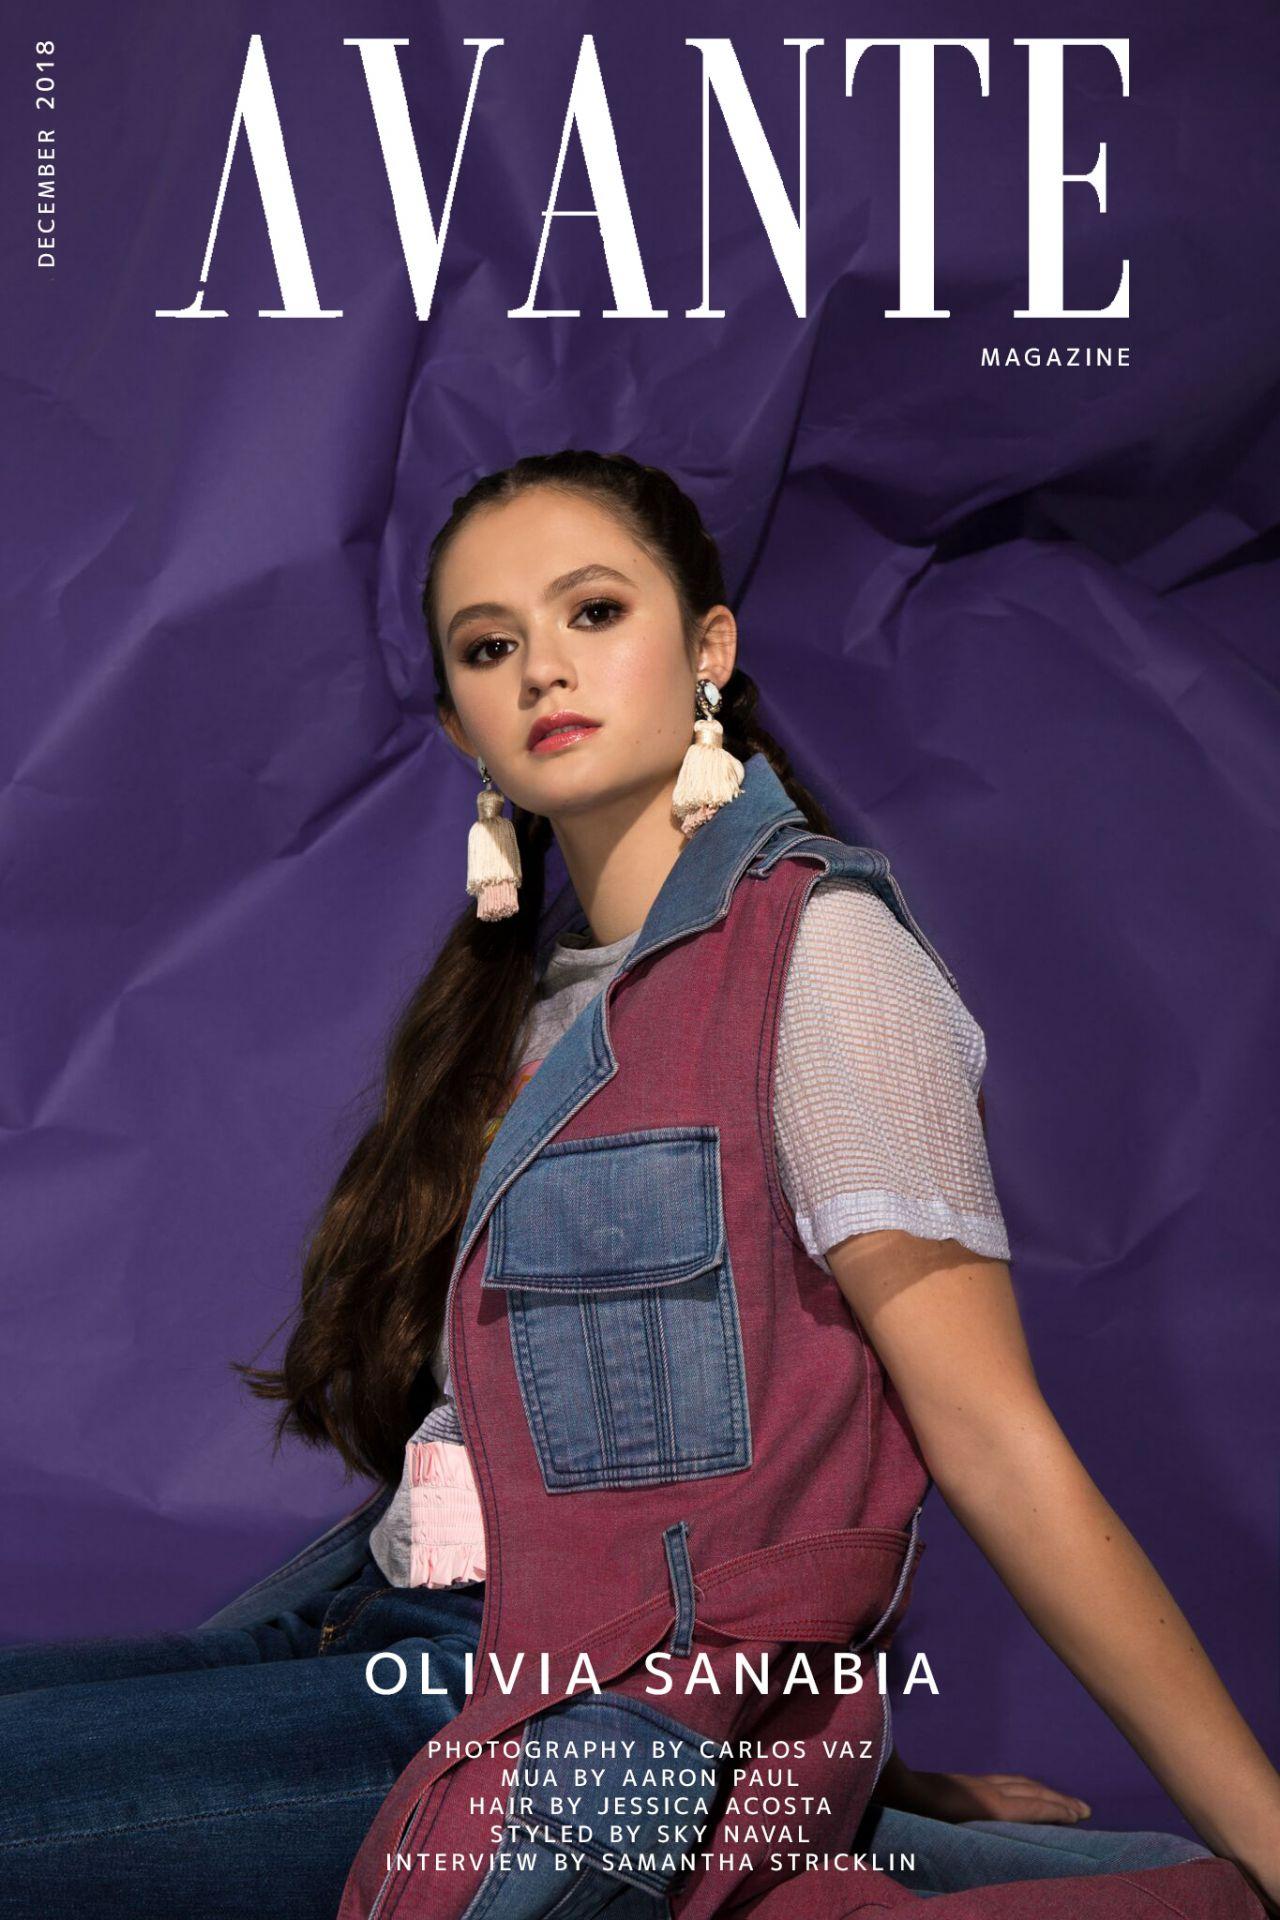 Olivia Sanabia Avante Magazine December 2018